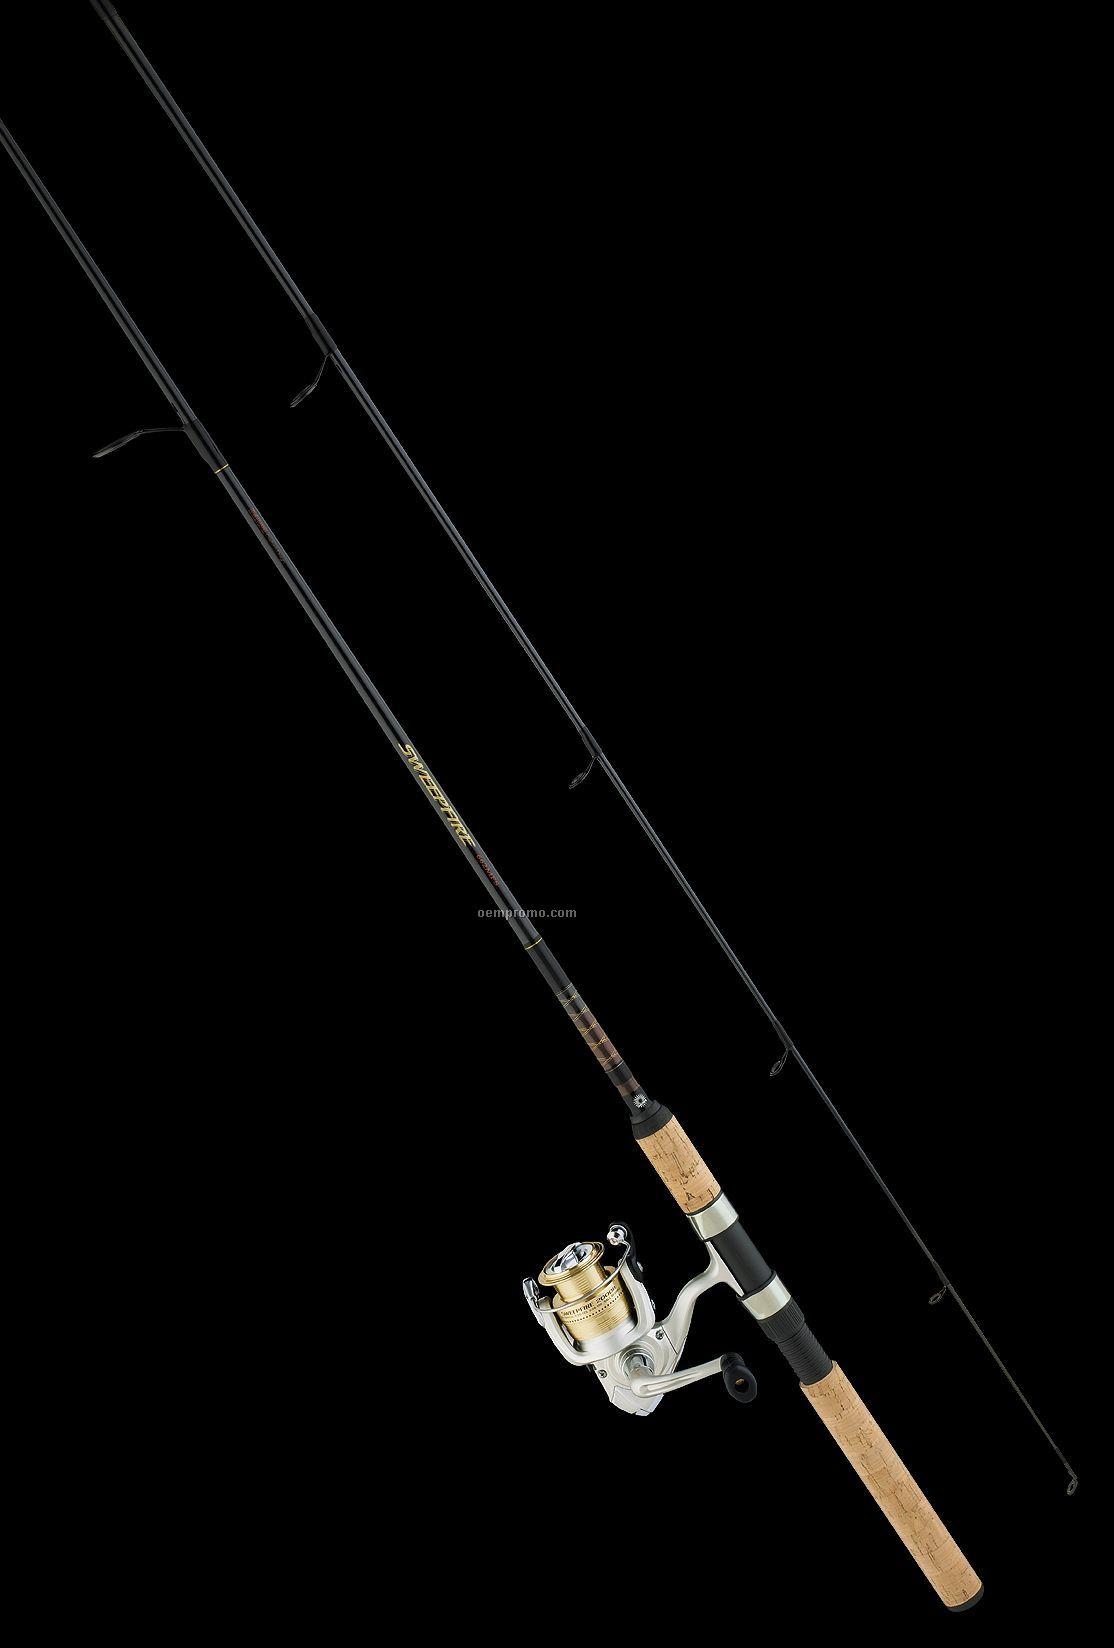 Daiwa Sweepfire Spinning Combo Rod/Reel